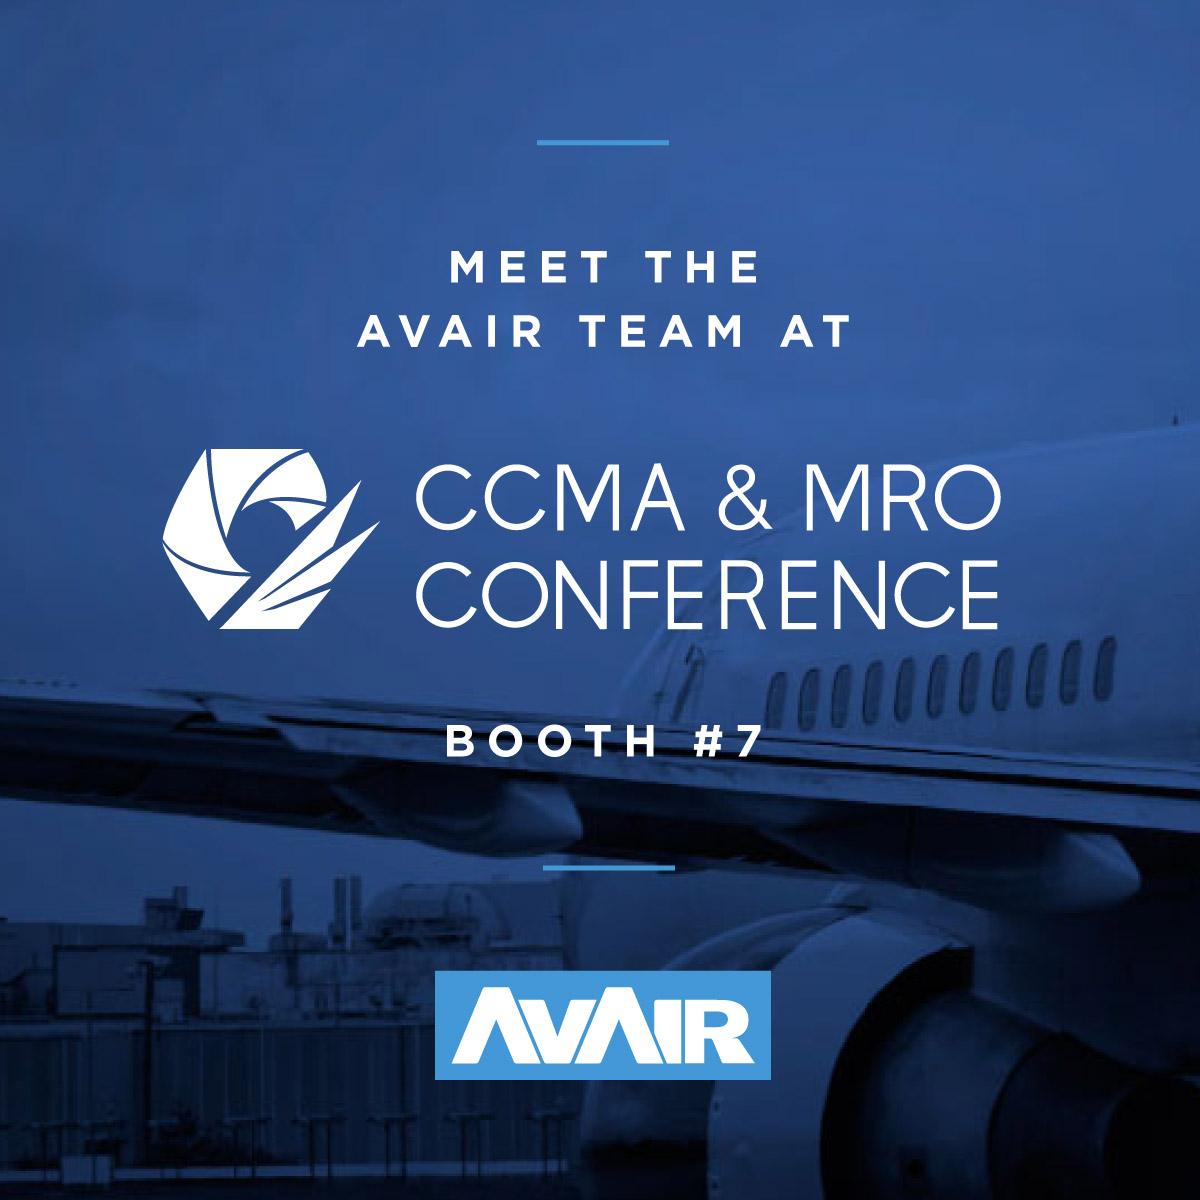 AvAir_MeetTheTeam_CCMA-sr03222018